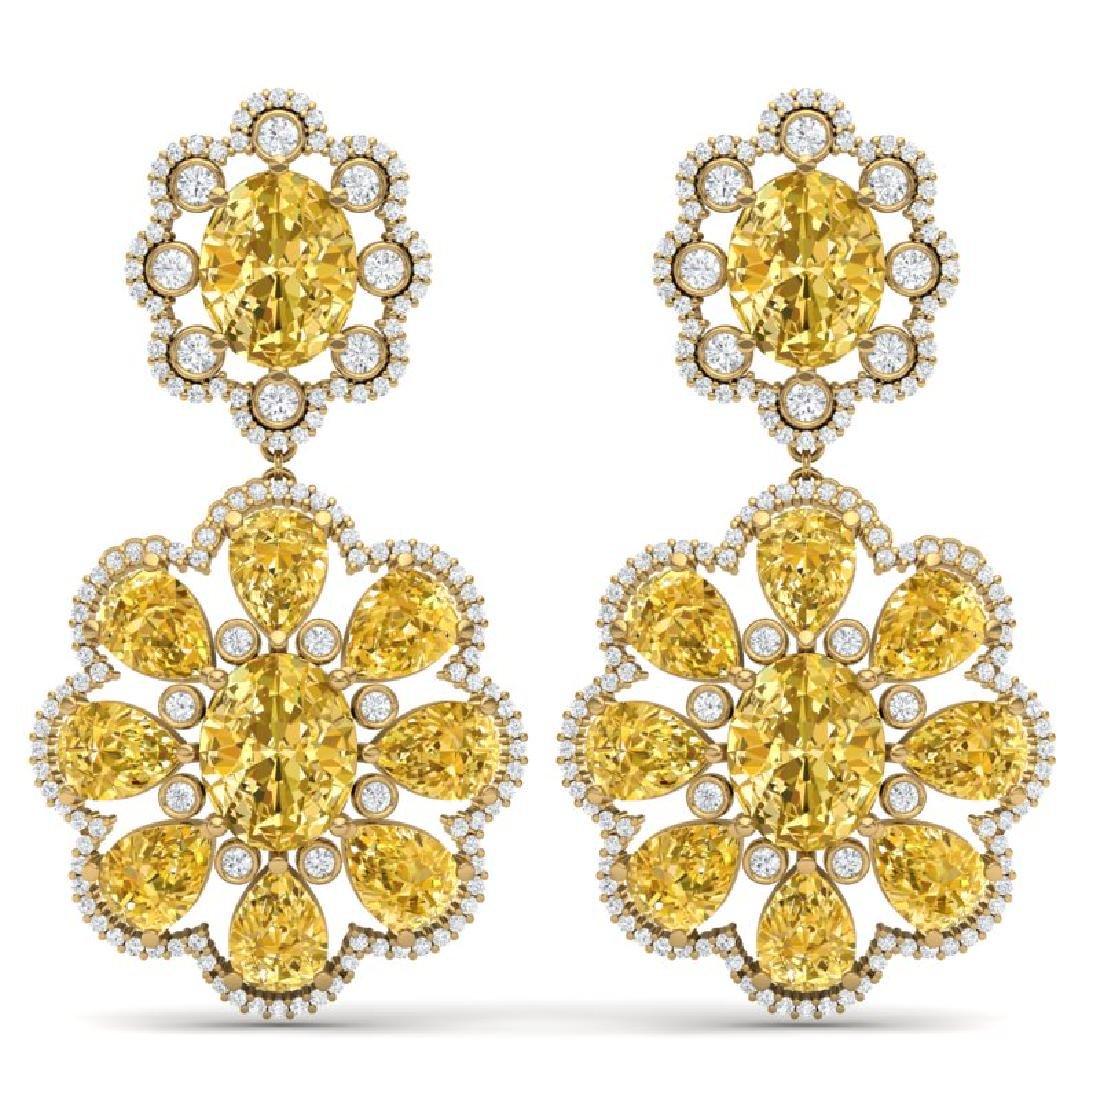 29.9 CTW Royalty Canary Citrine & VS Diamond Earrings